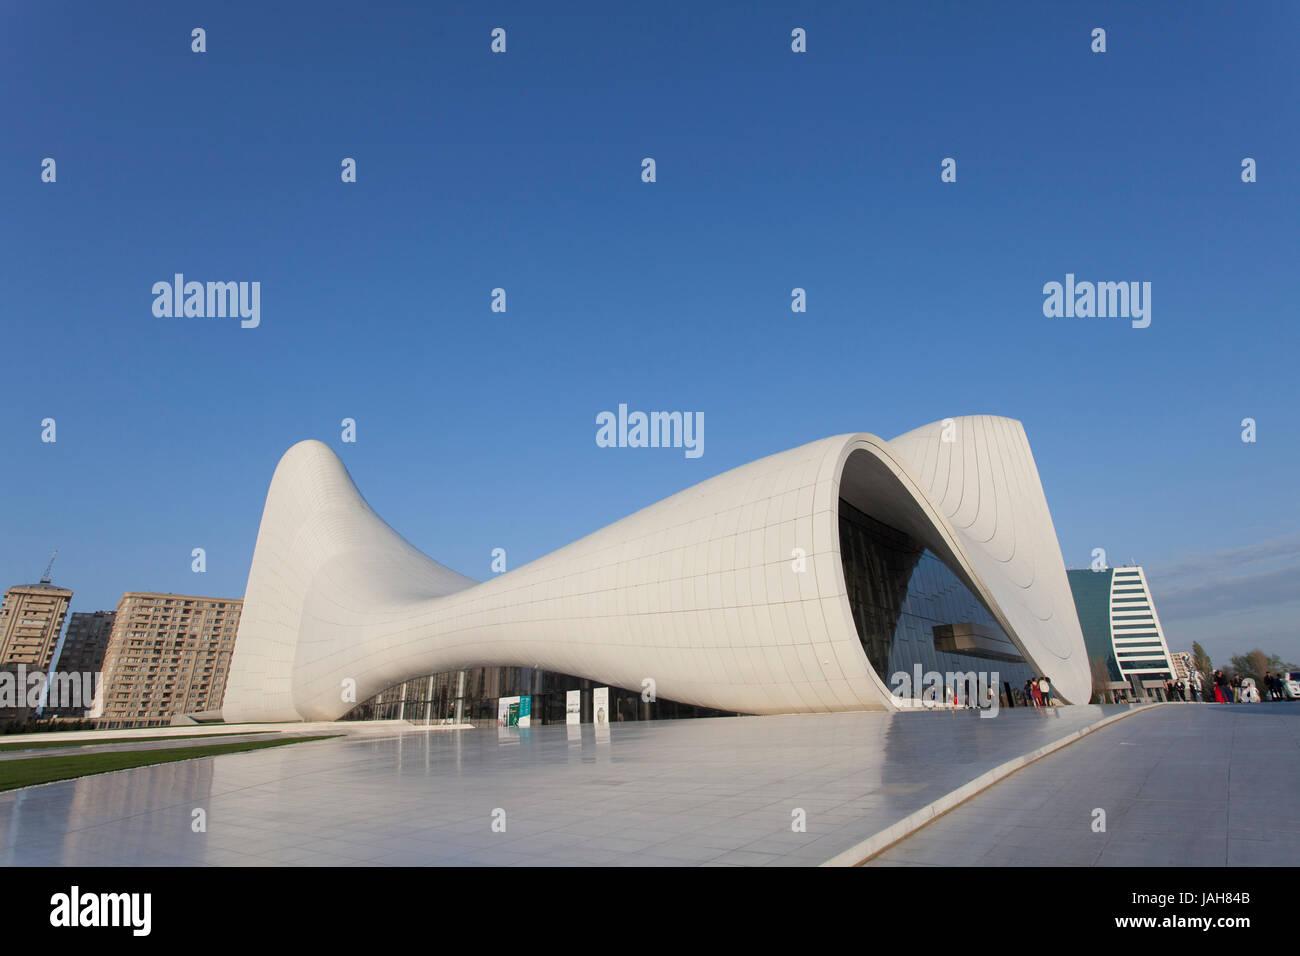 Zaha Hadid's Heydar Aliyev Museum, Baku, Azerbaijan - Stock Image